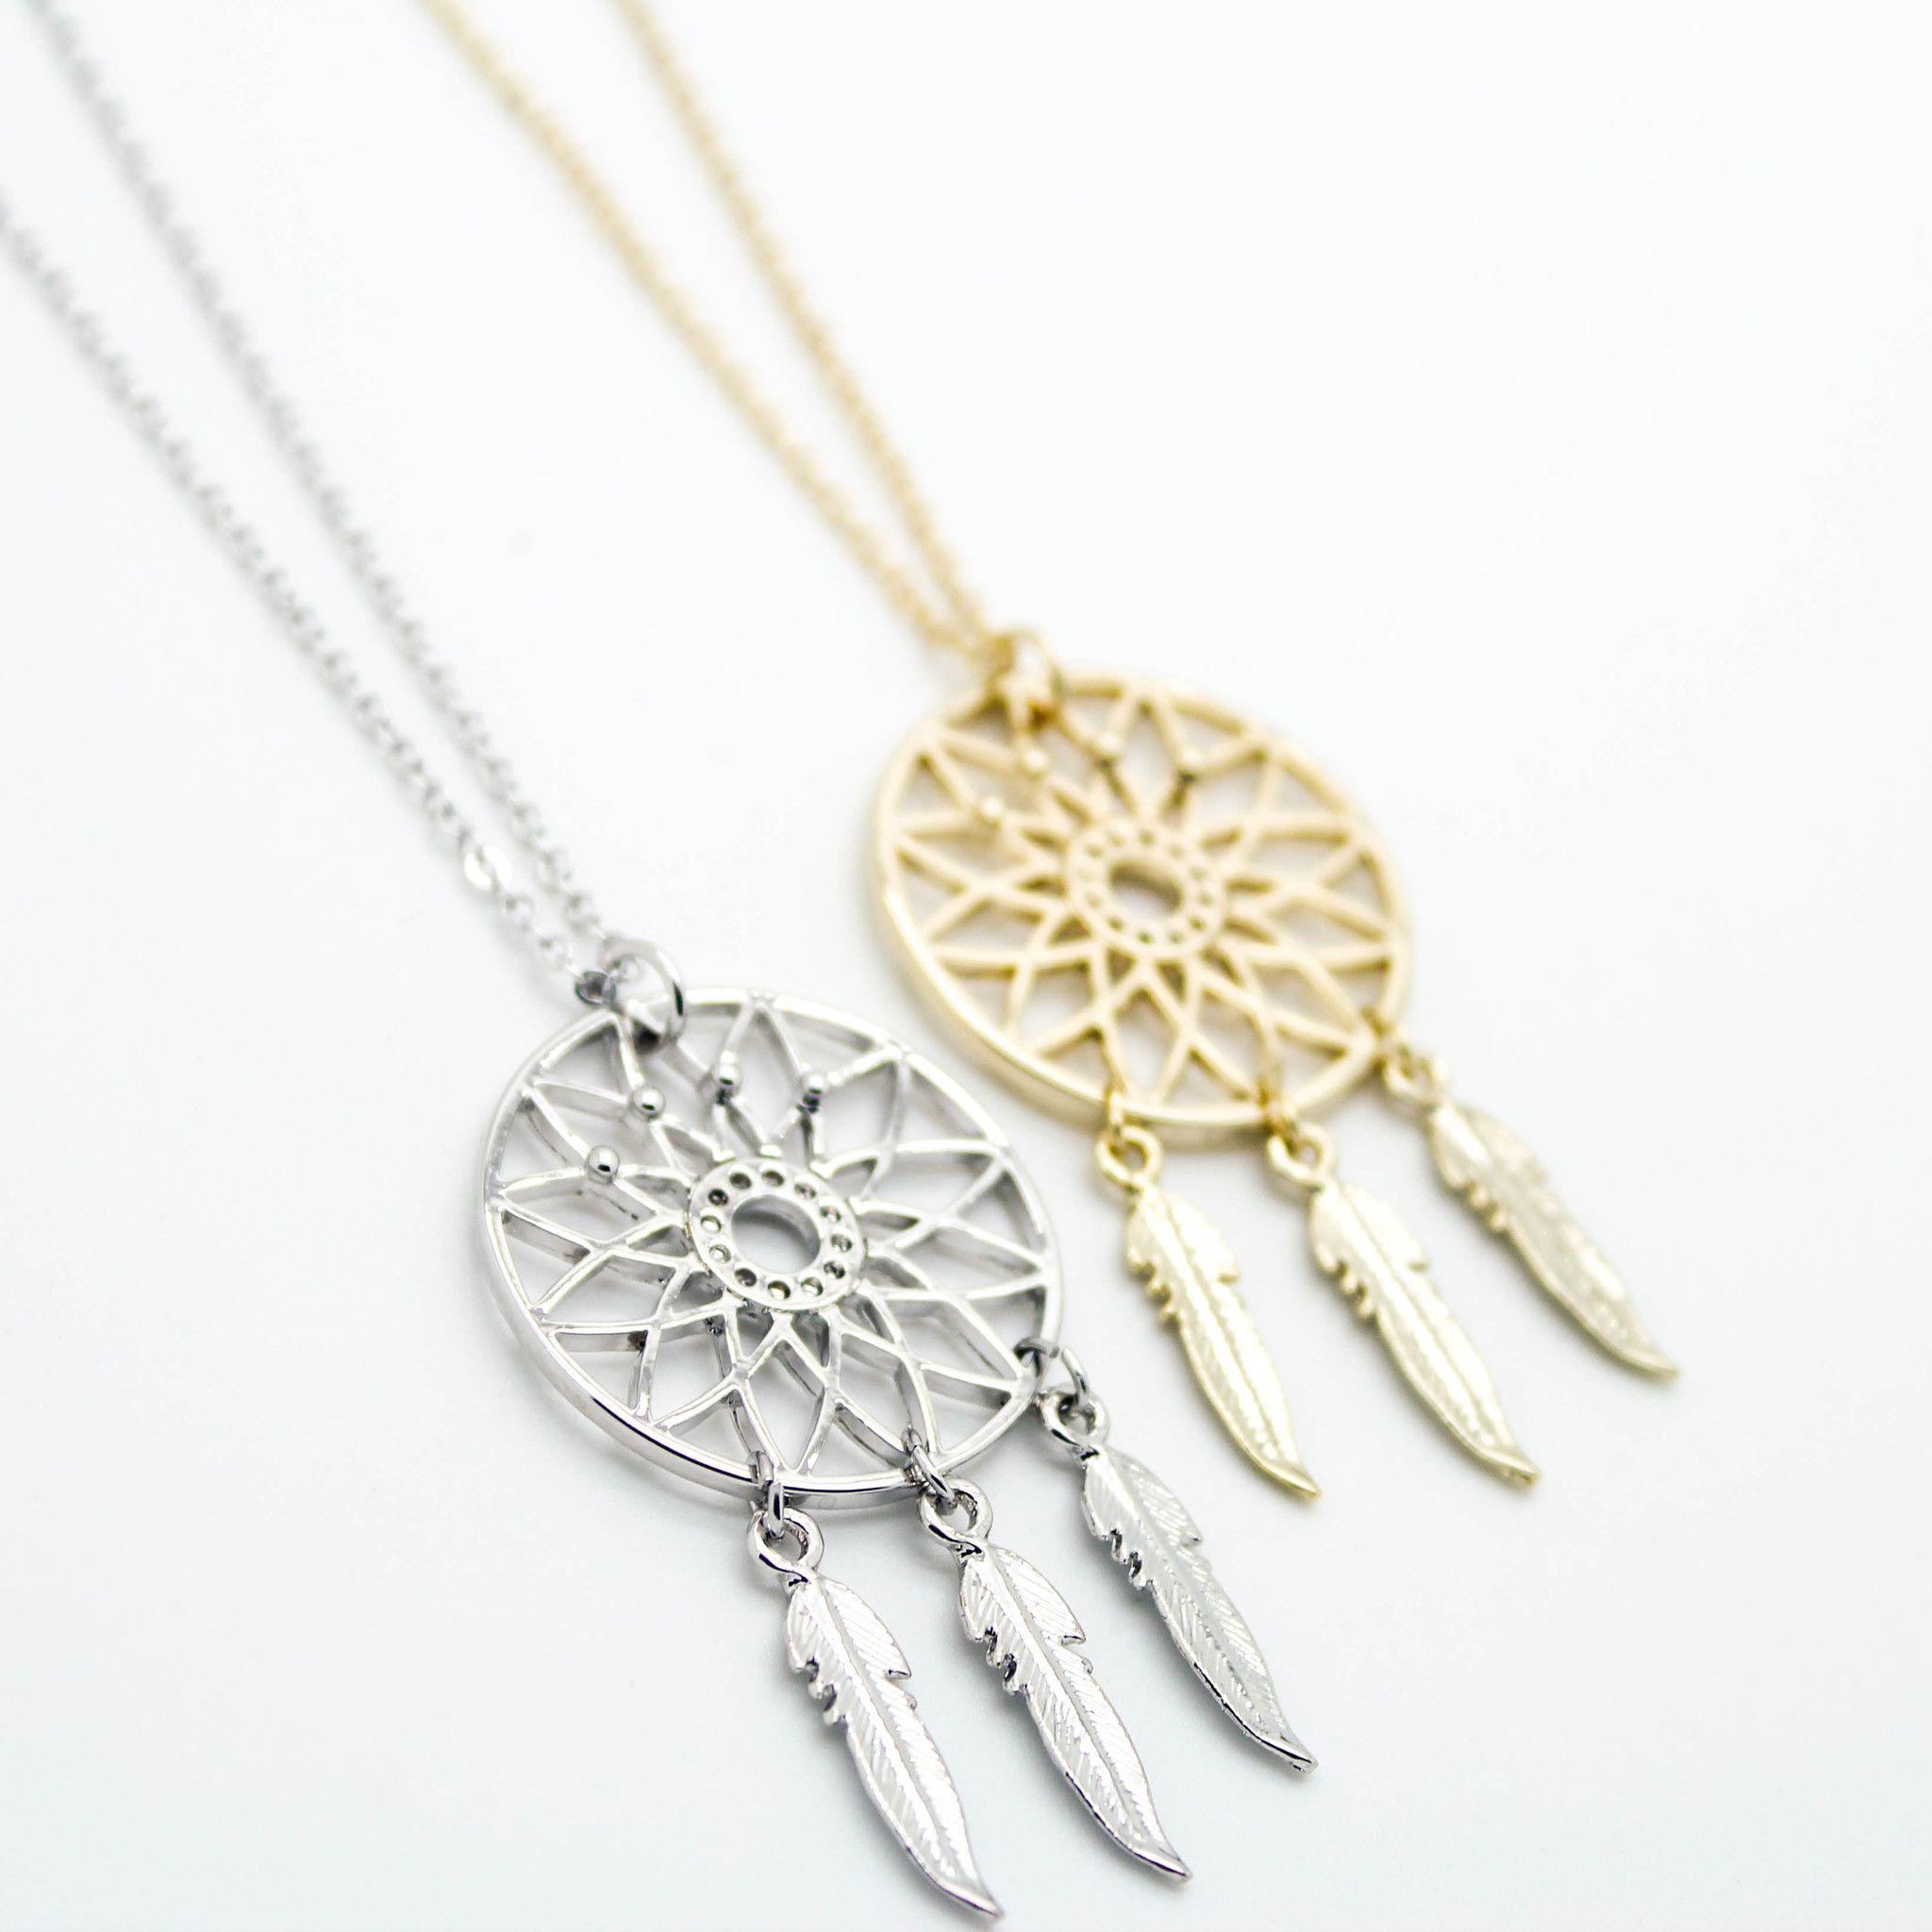 Dreamcatcher long necklace pendants gold and bling bling dreamcatcher long necklace aloadofball Choice Image